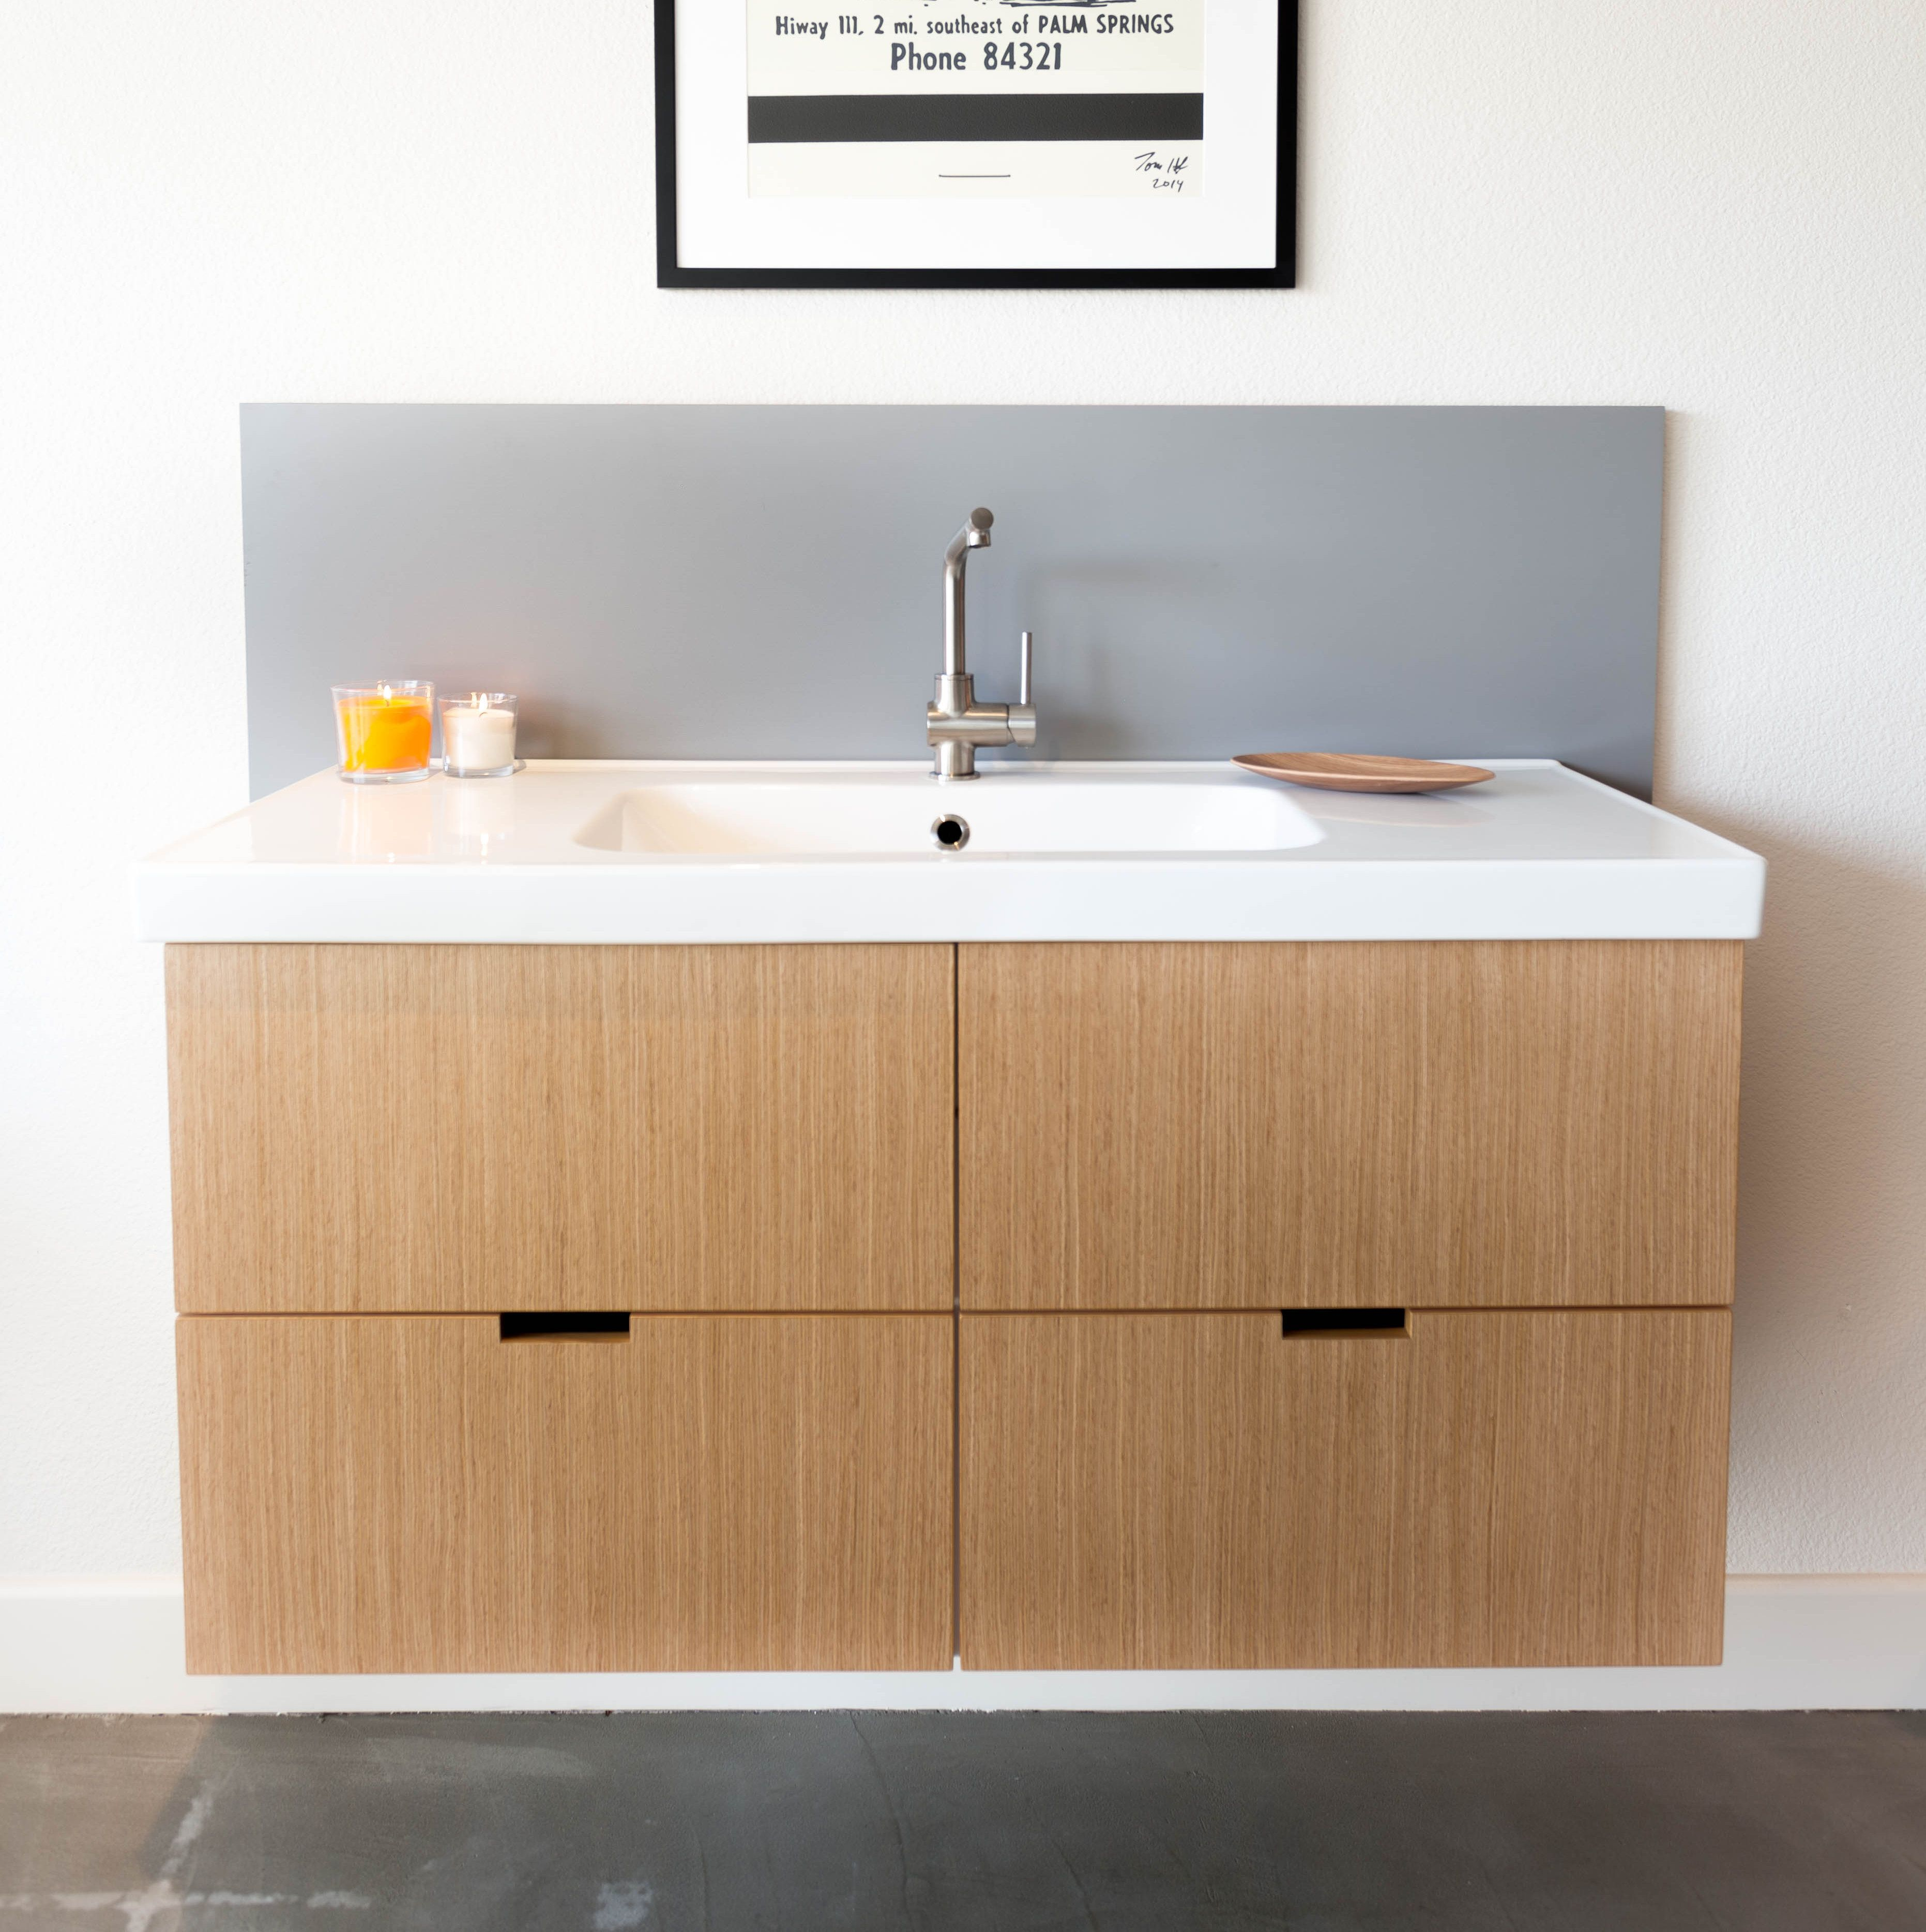 Semihandmade Eco Oak Ikea Godmorgon Cabinet Note Notches Are No Longer Available Ikea Godmorgon Eco Bathroom Bathroom Furniture